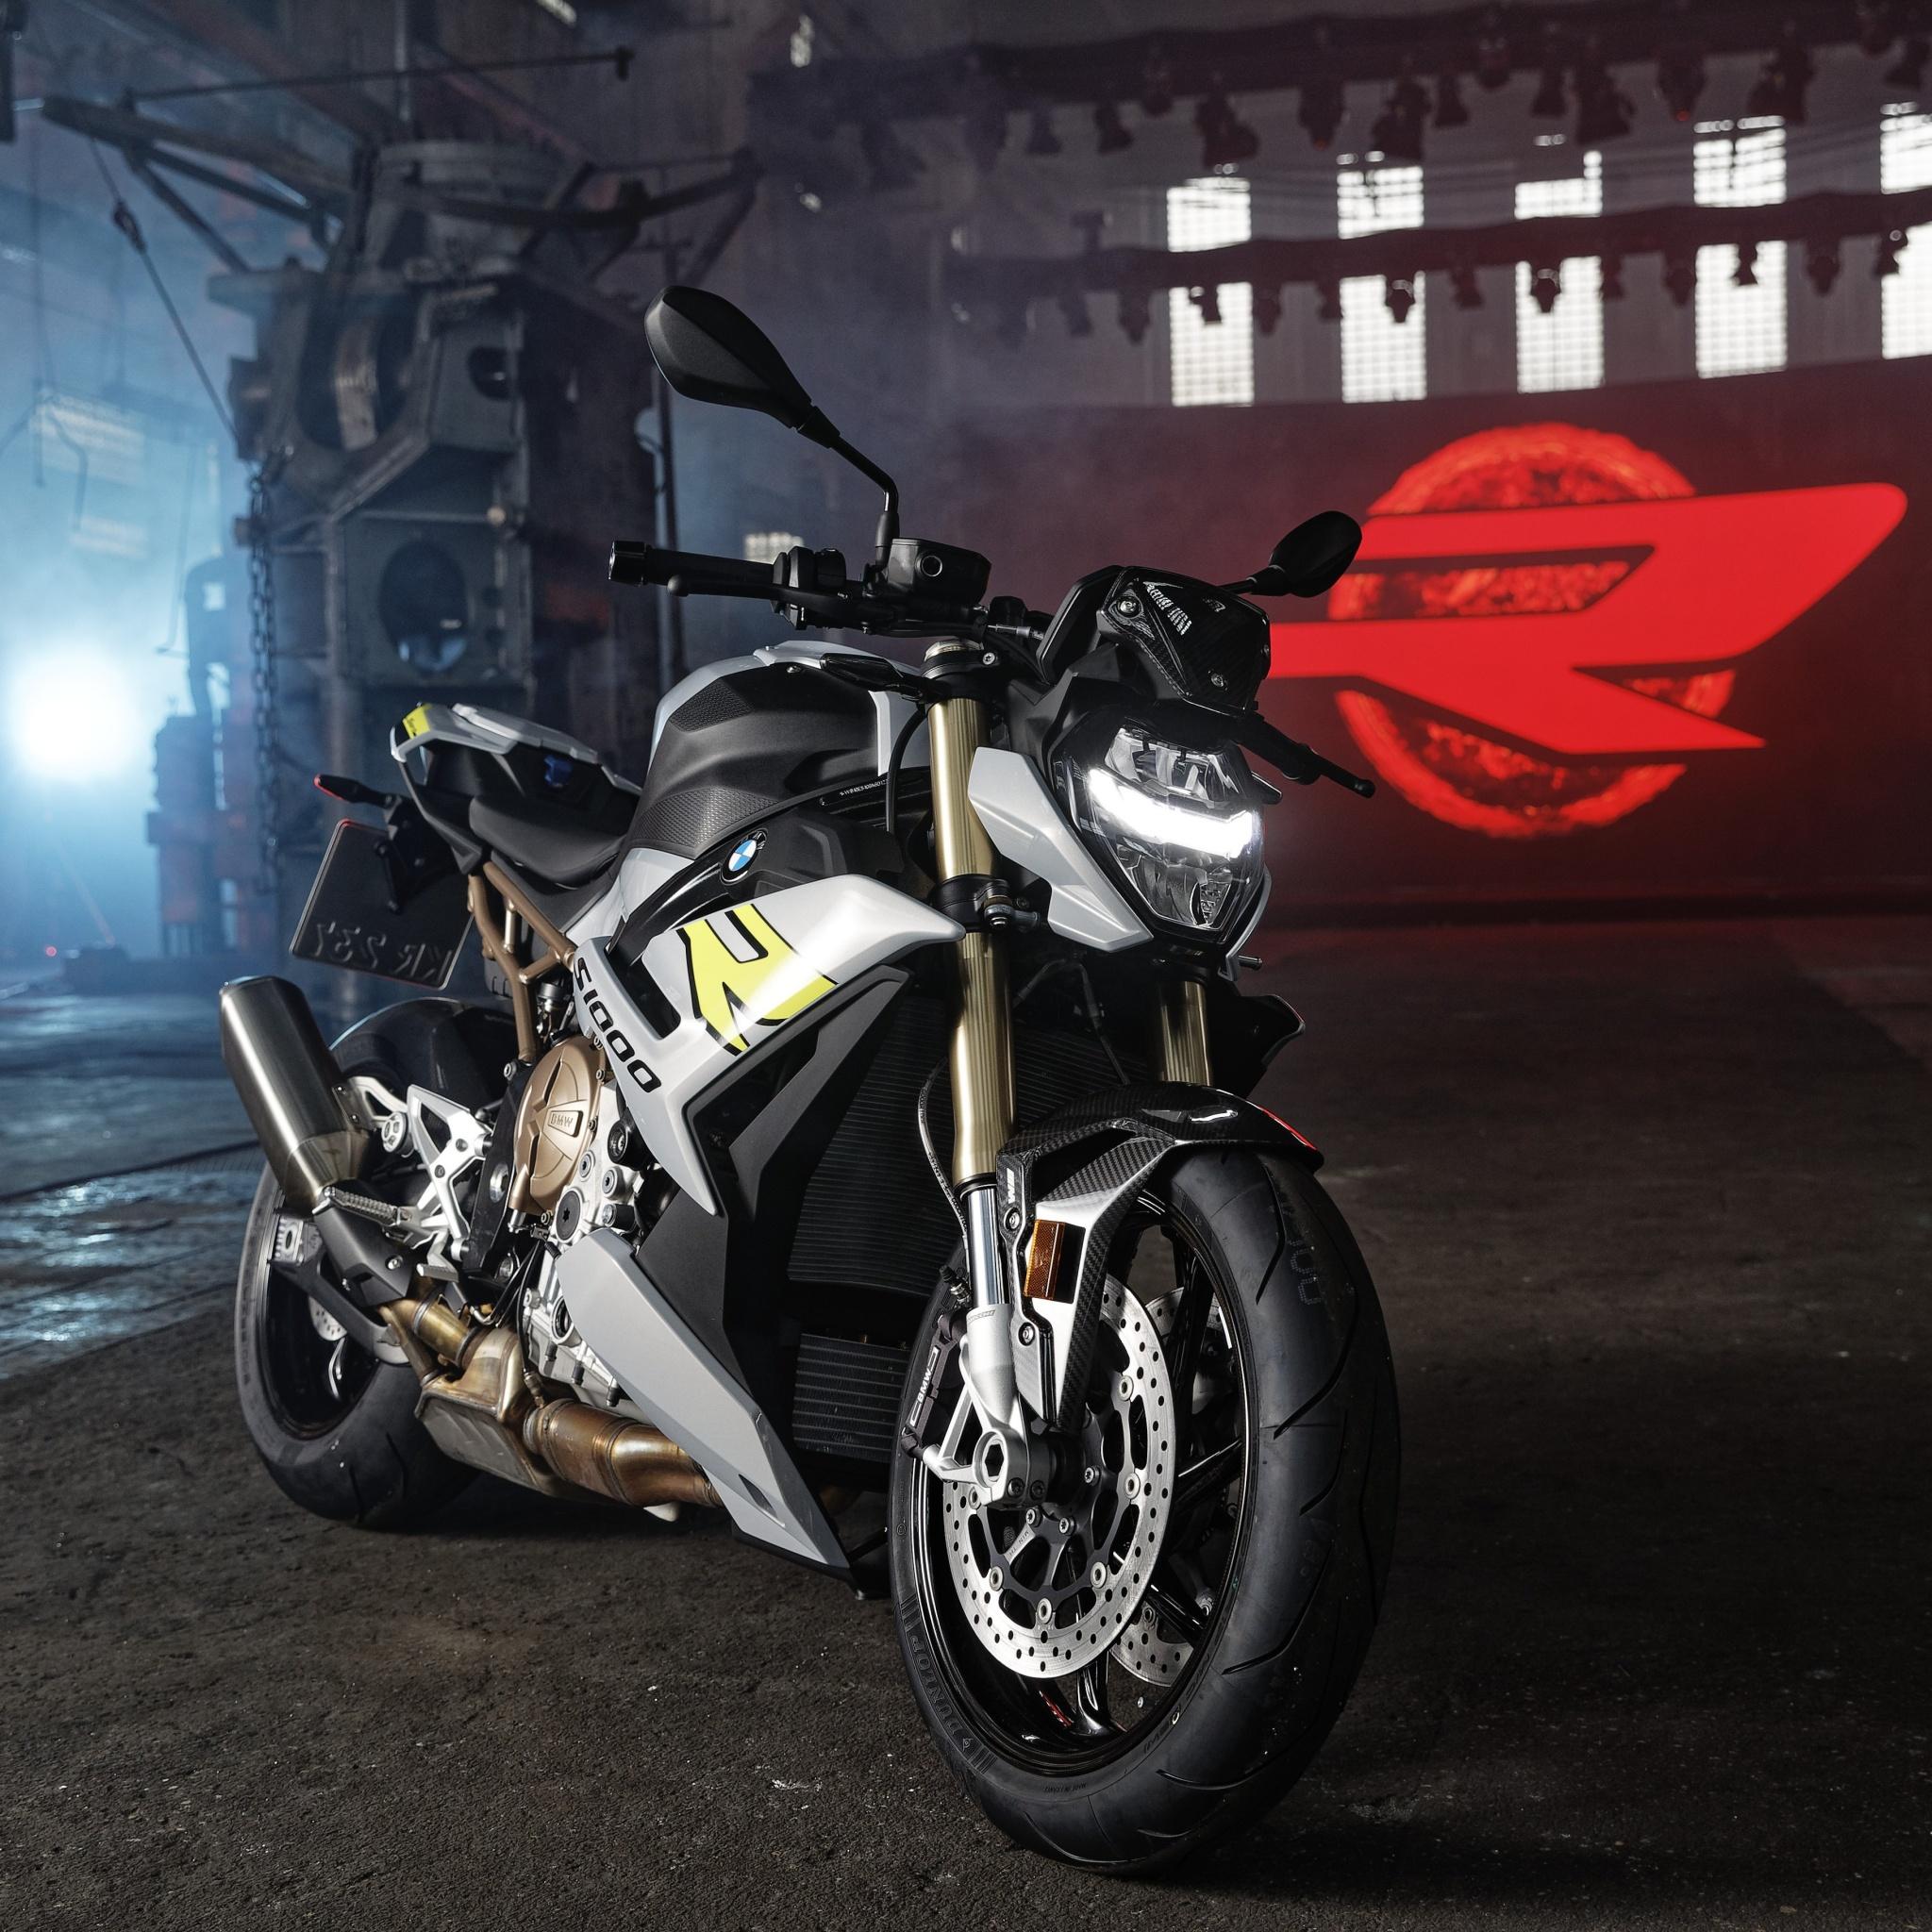 bmw s1000r 4k wallpaper, superbikes, 2021, 5k, bikes, #3432